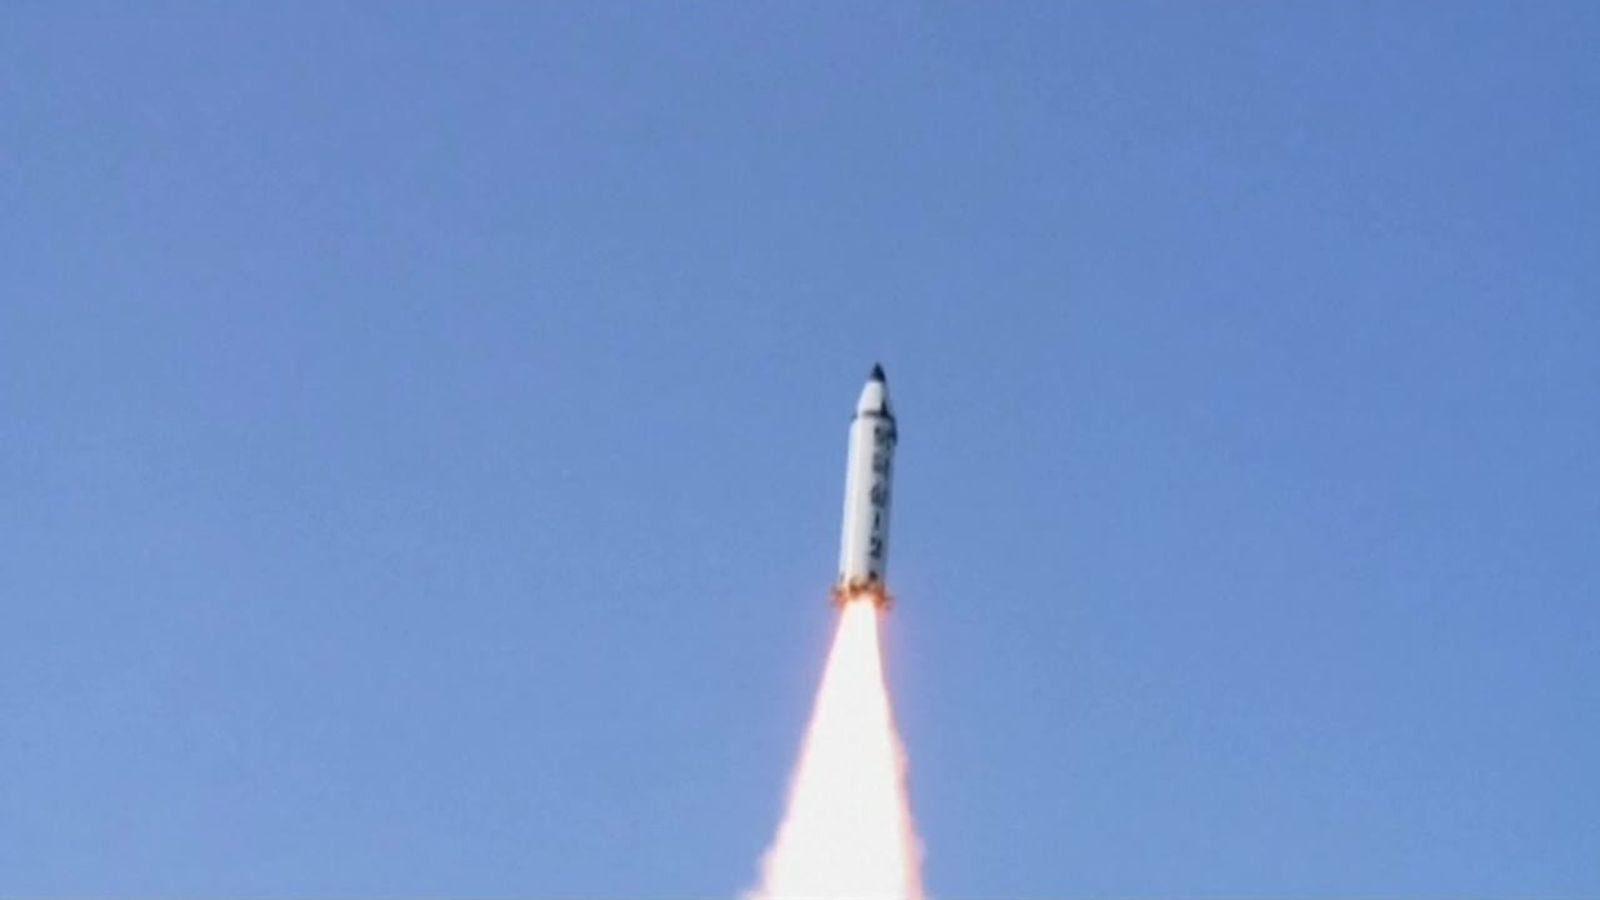 North Korea tested the Pukguksong-2 missile on Sunday